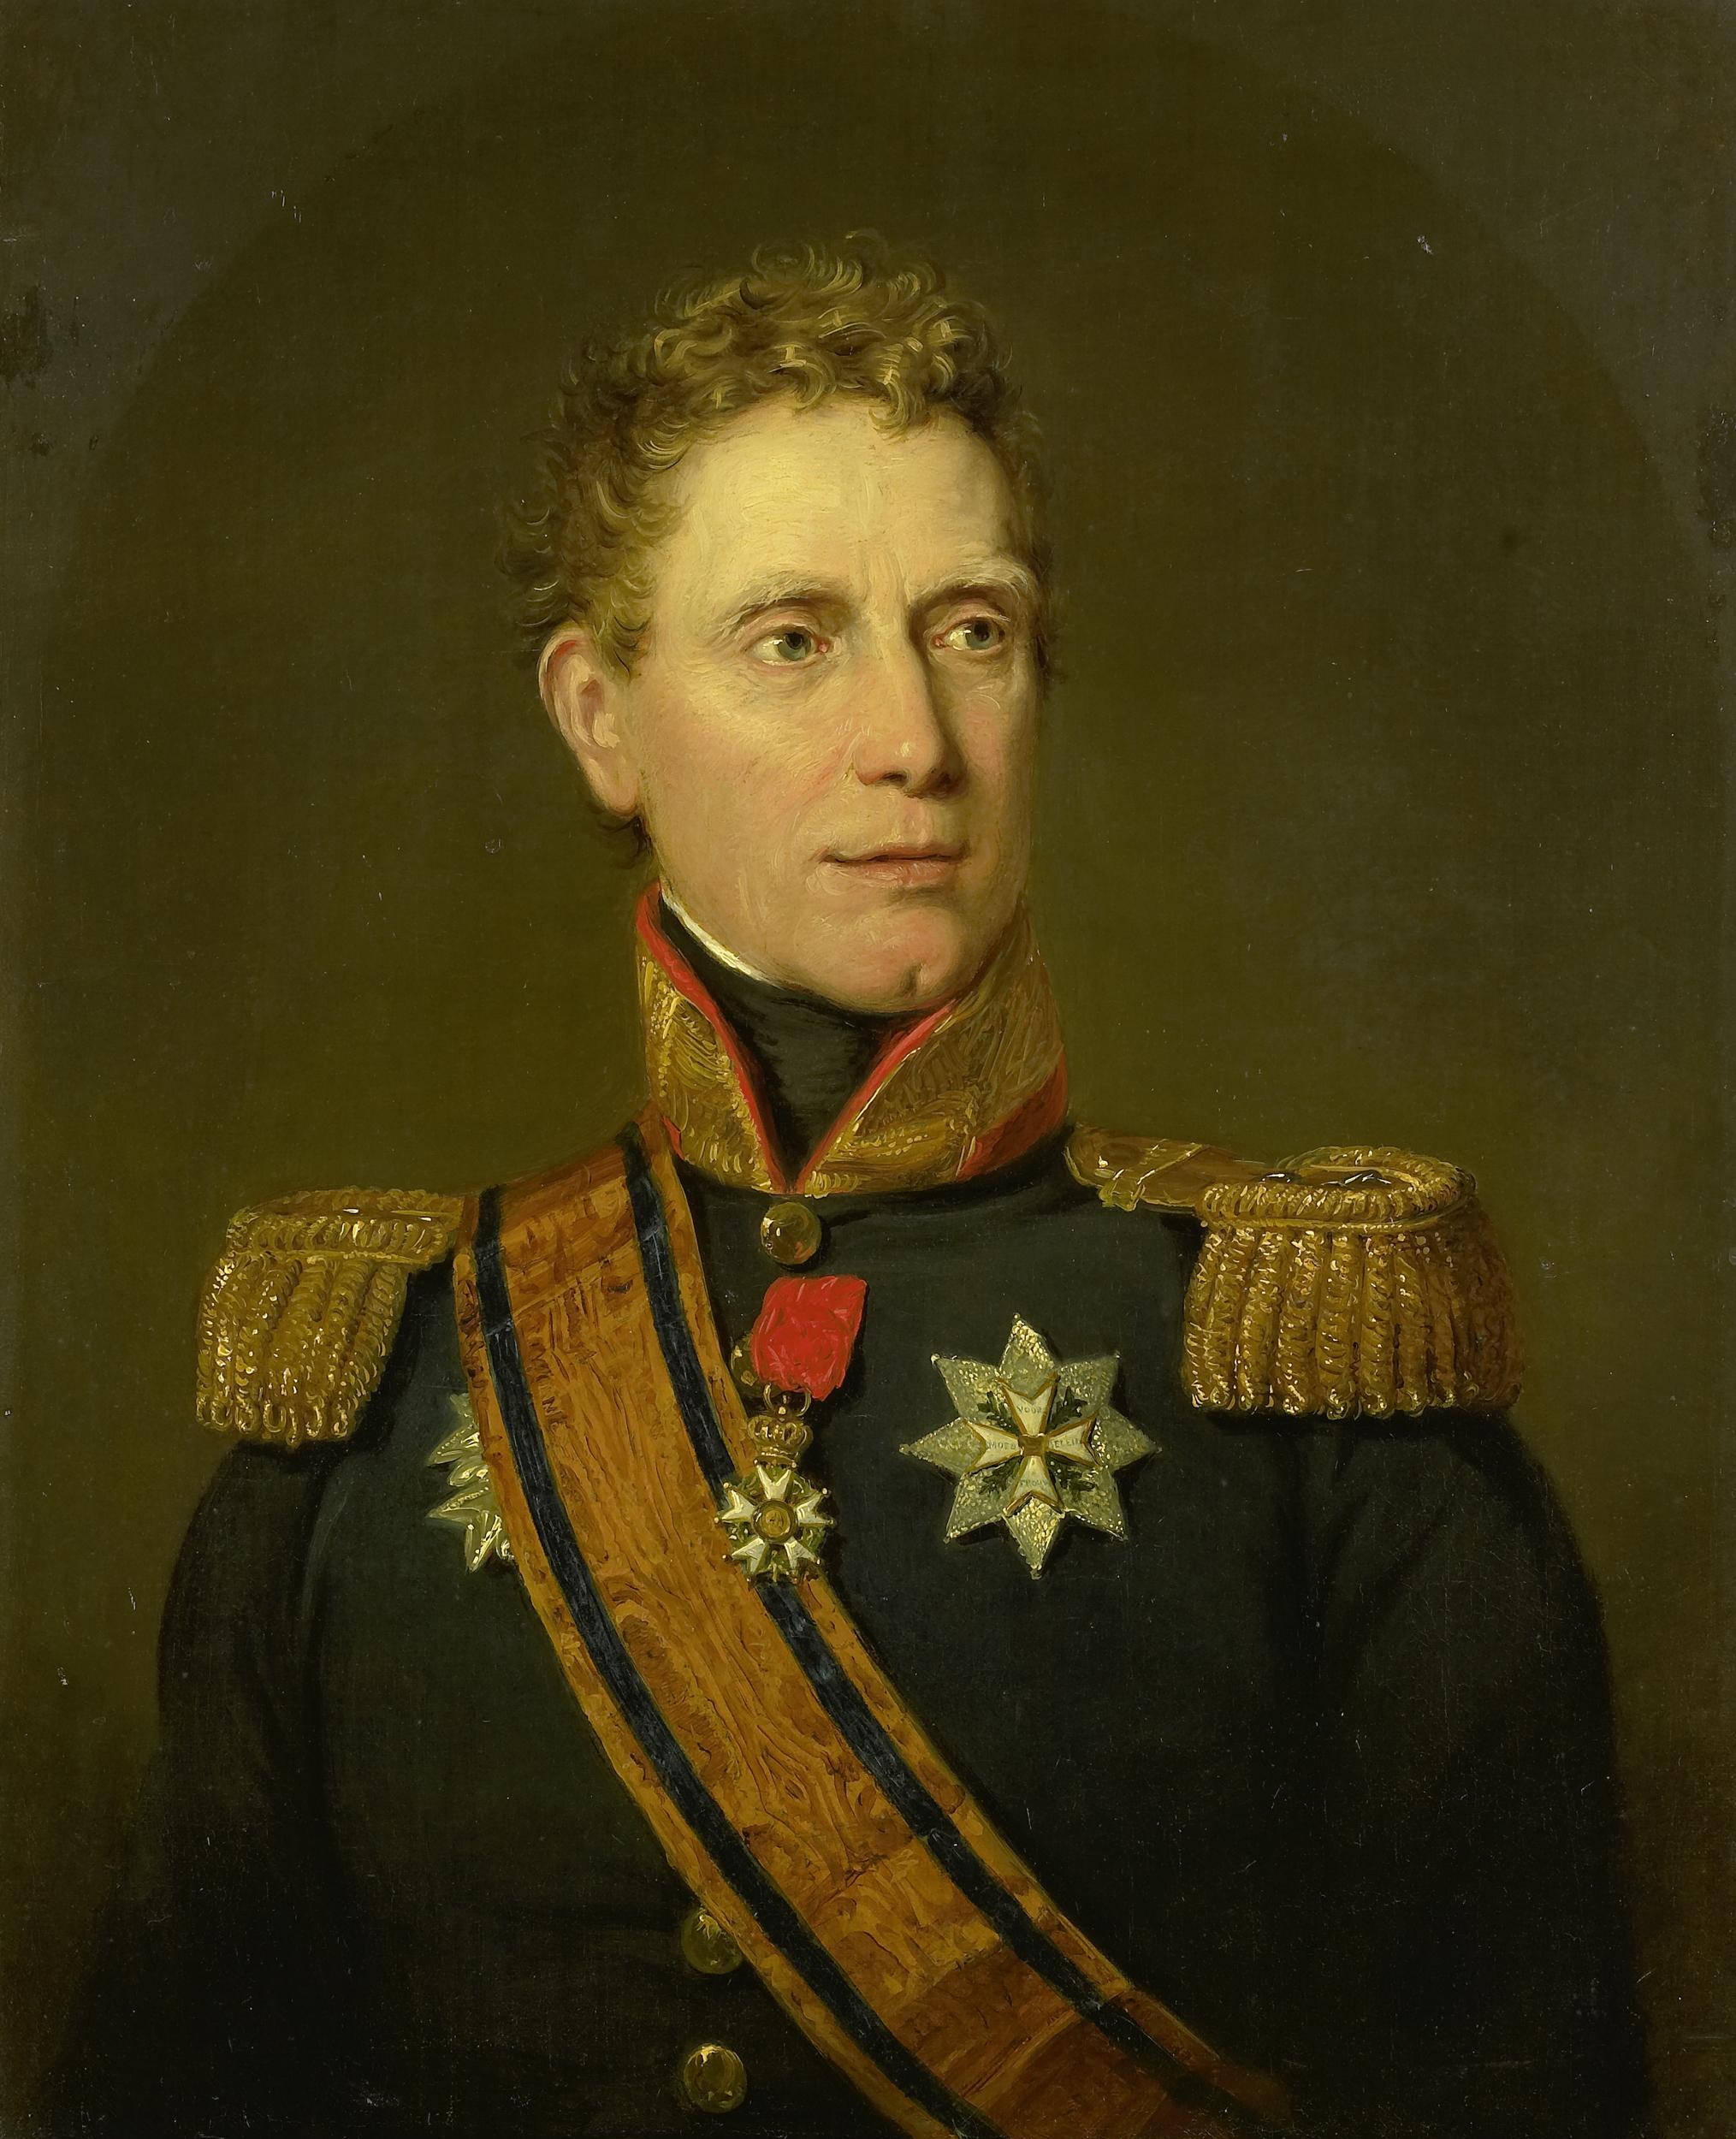 H King Oil Painting School